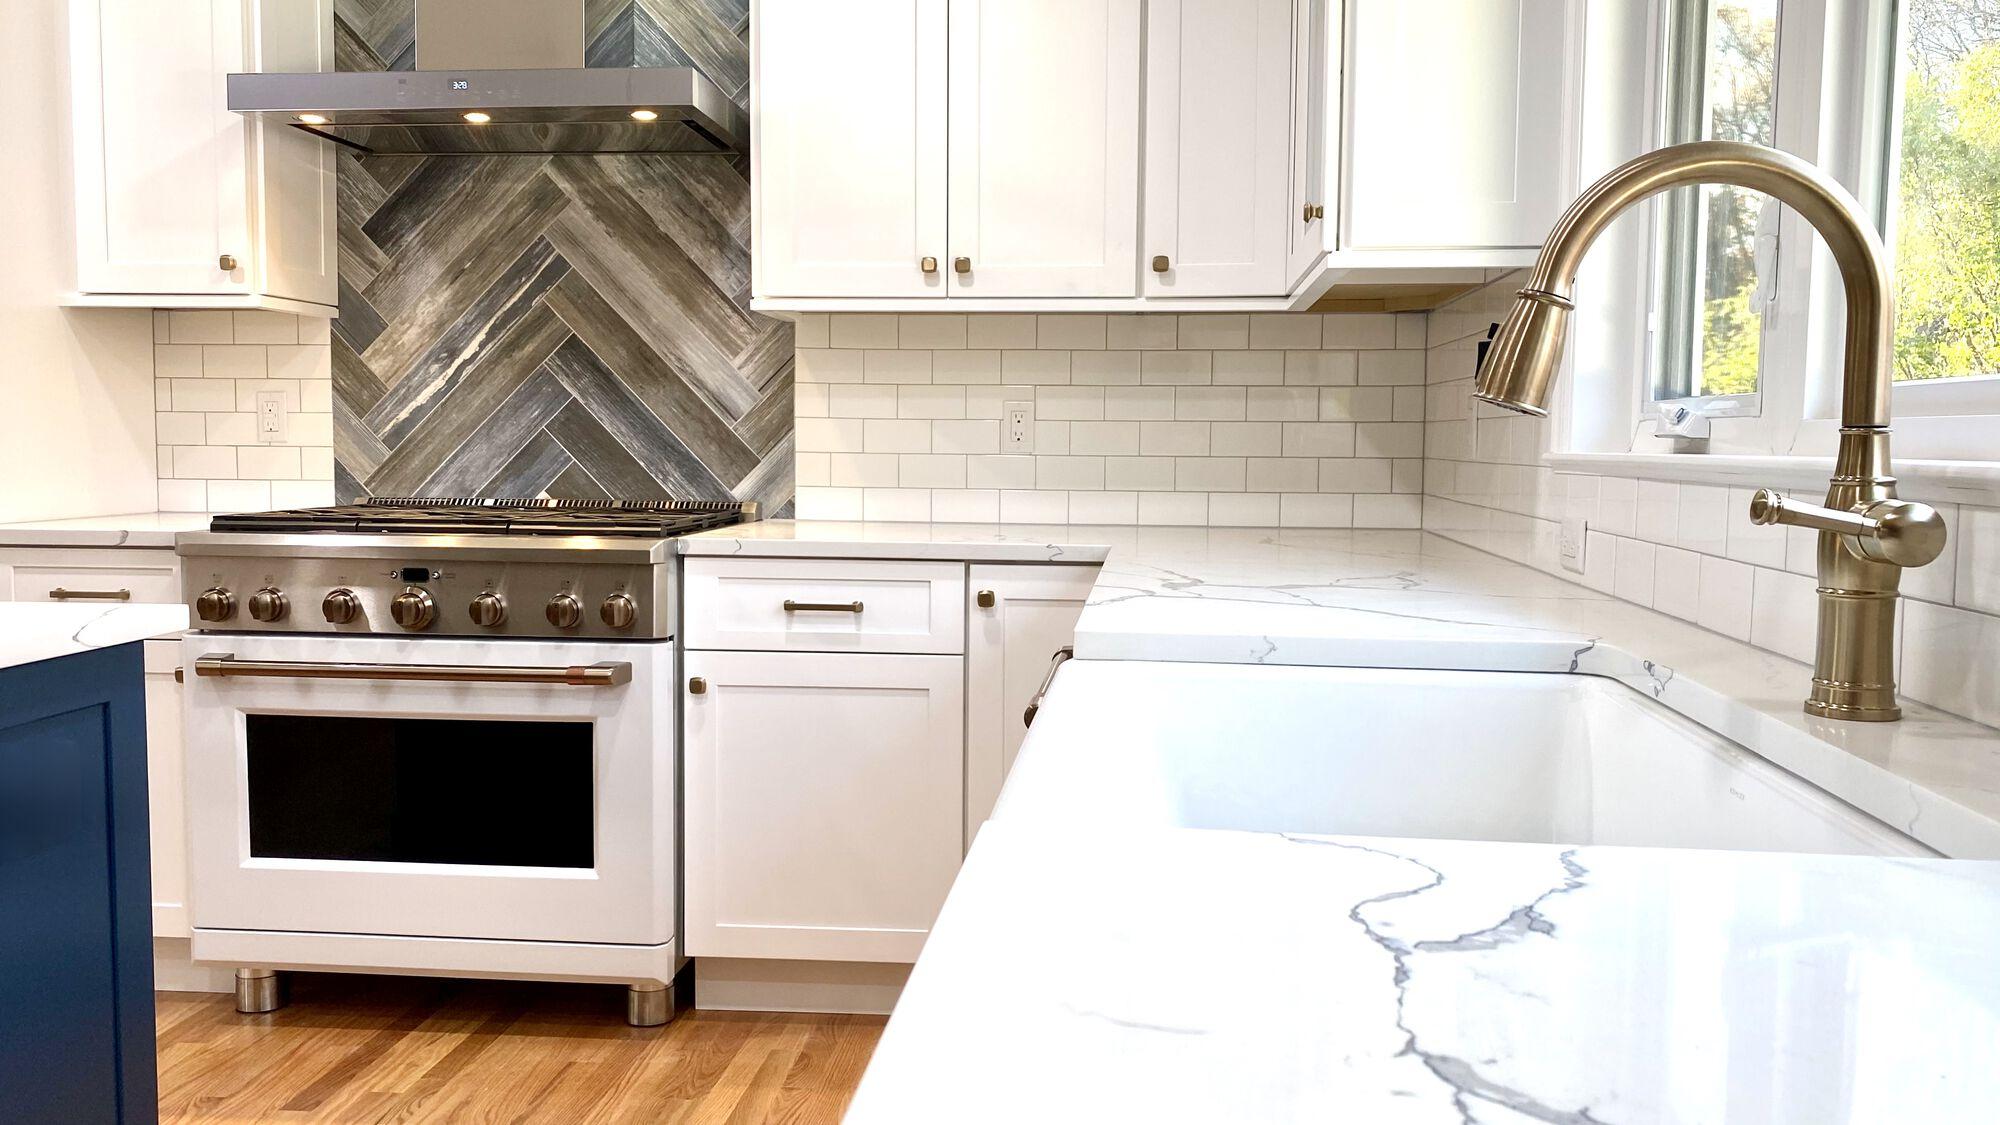 Shaker Full Overlay Wood Cabinetry, Subway and Herringbone Splash, Kohler Fixtures, GE Cafe Appliances in Berkeley Heights, Union County NJ